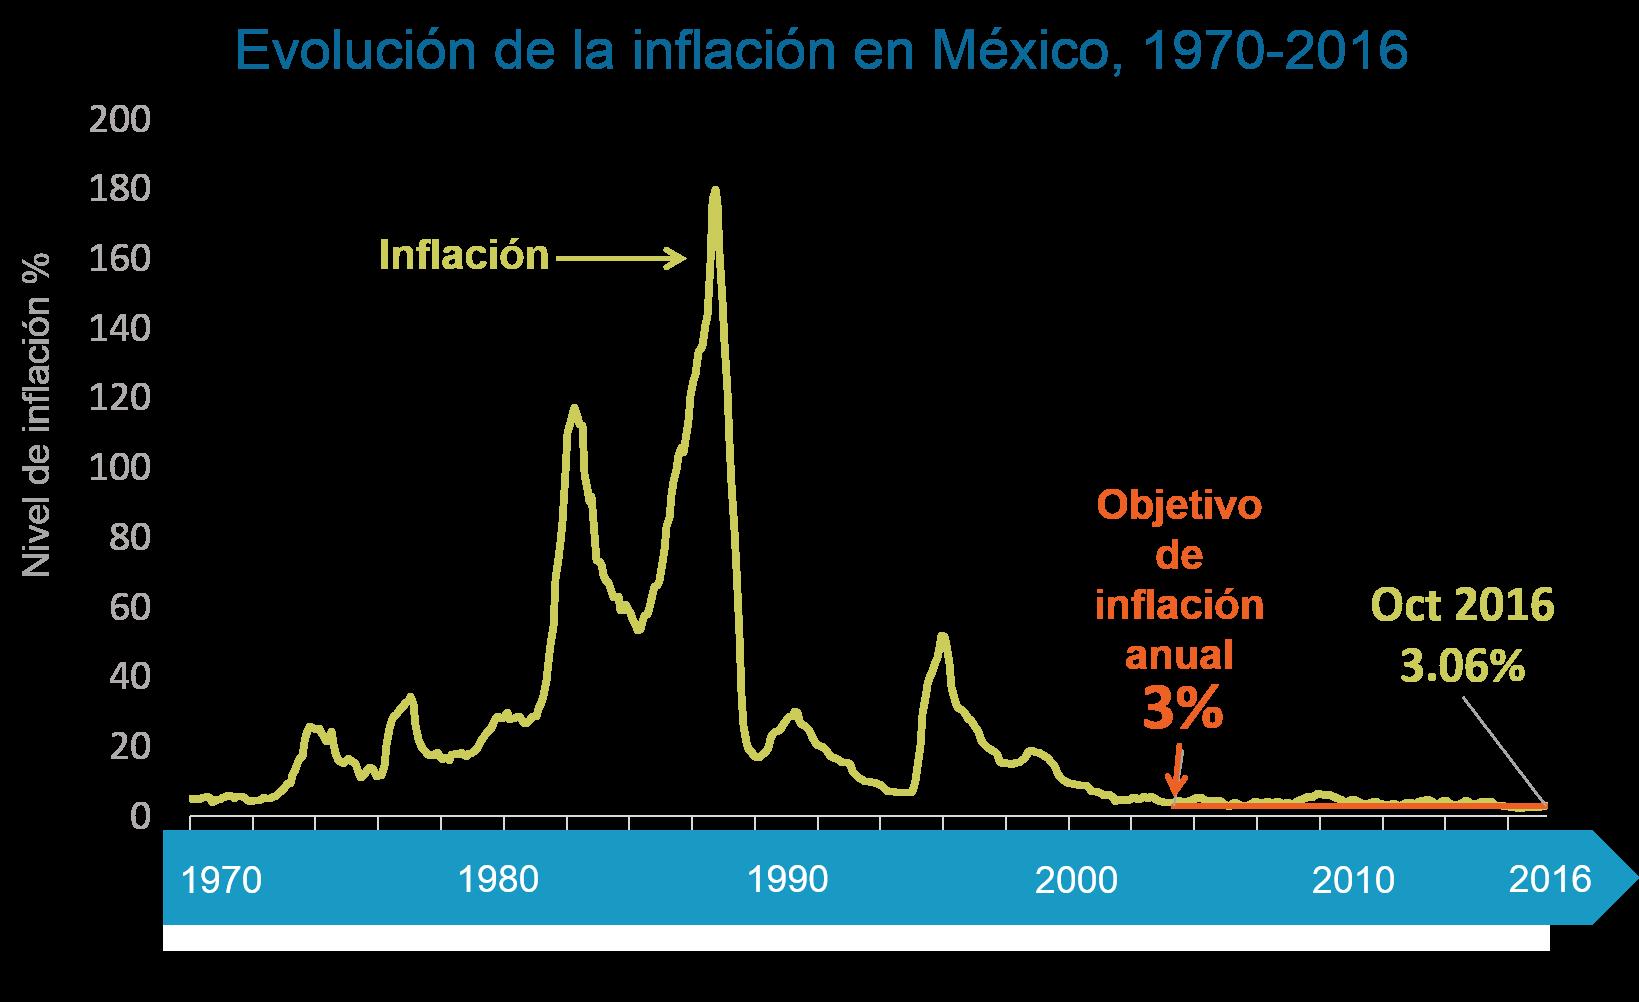 Inflacion_en_Mexico.png